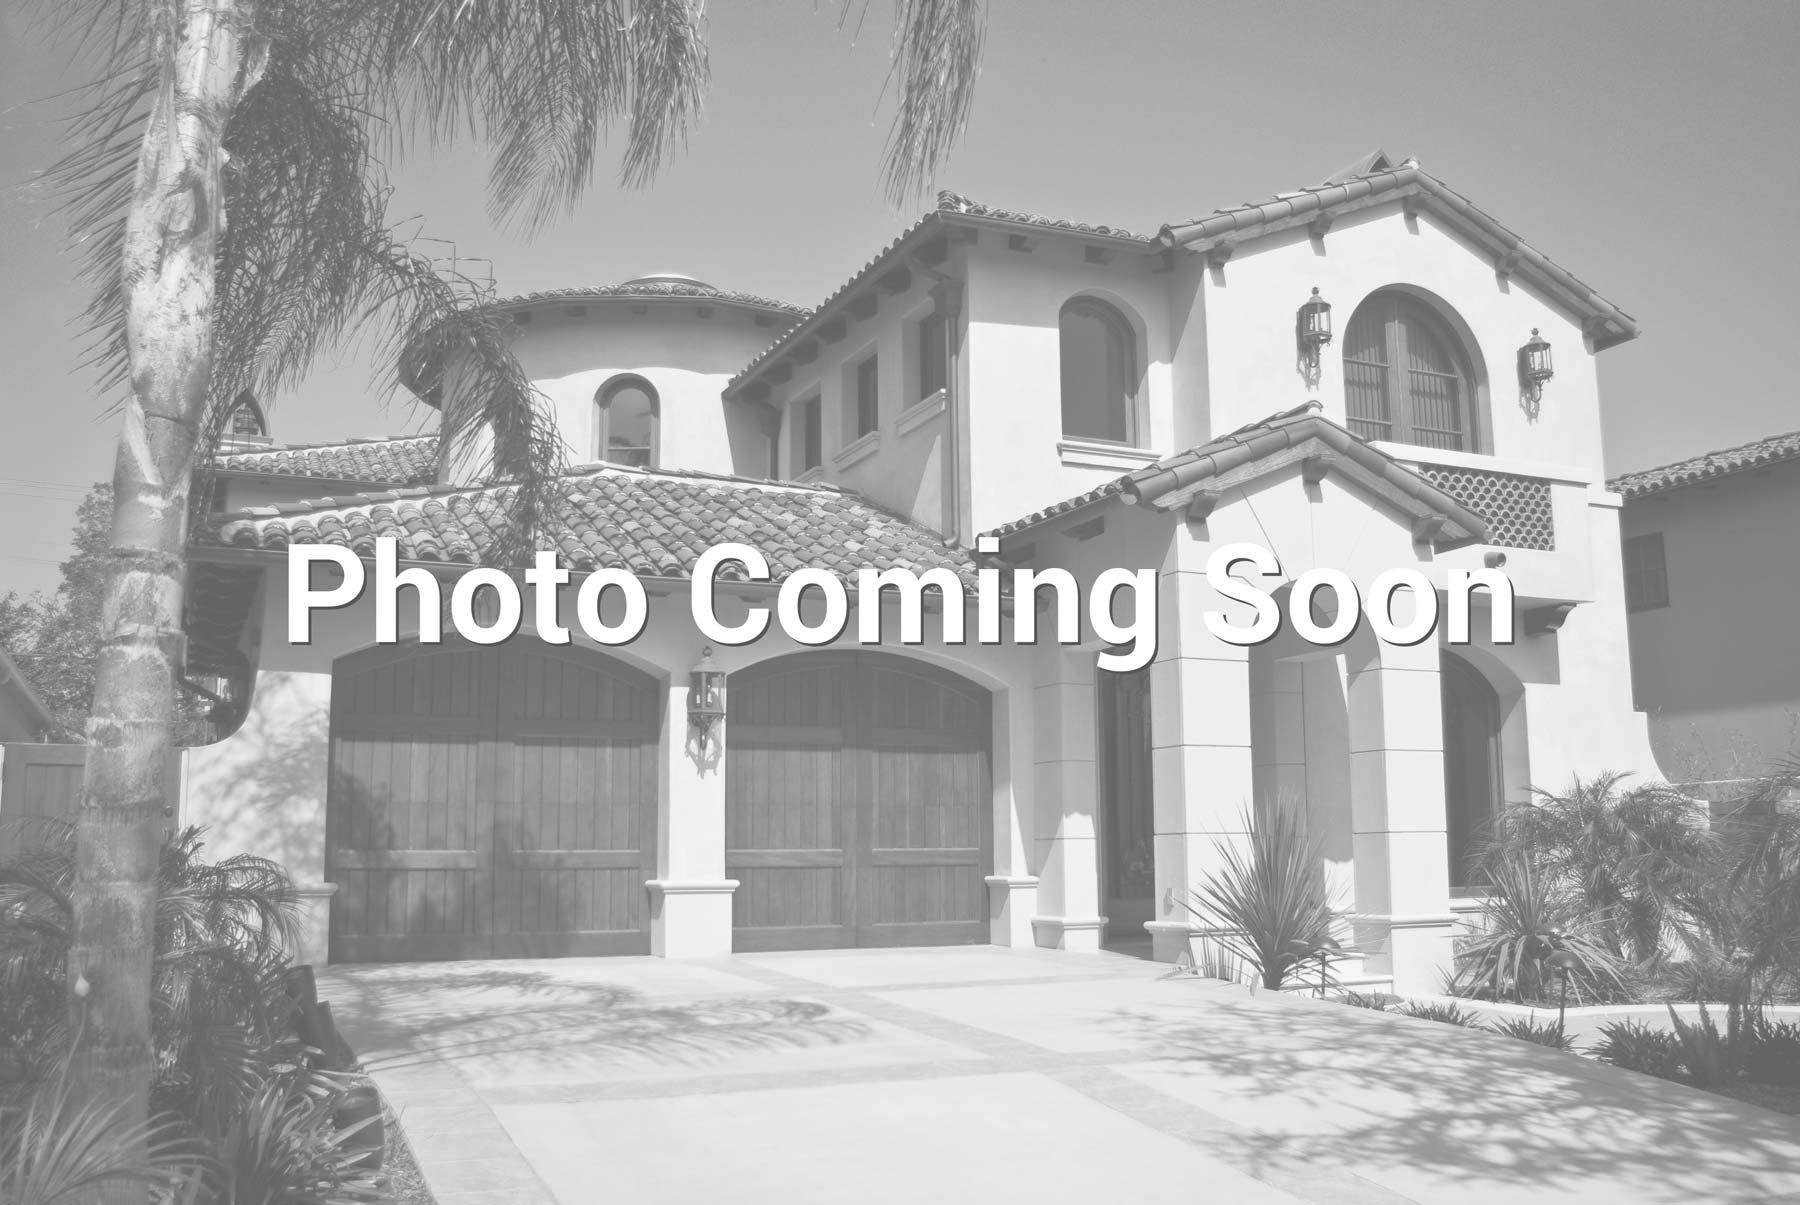 $405,000 - 3Br/2Ba - Home for Sale in Autumn Ridge 2 Lot 1-88, Glendale